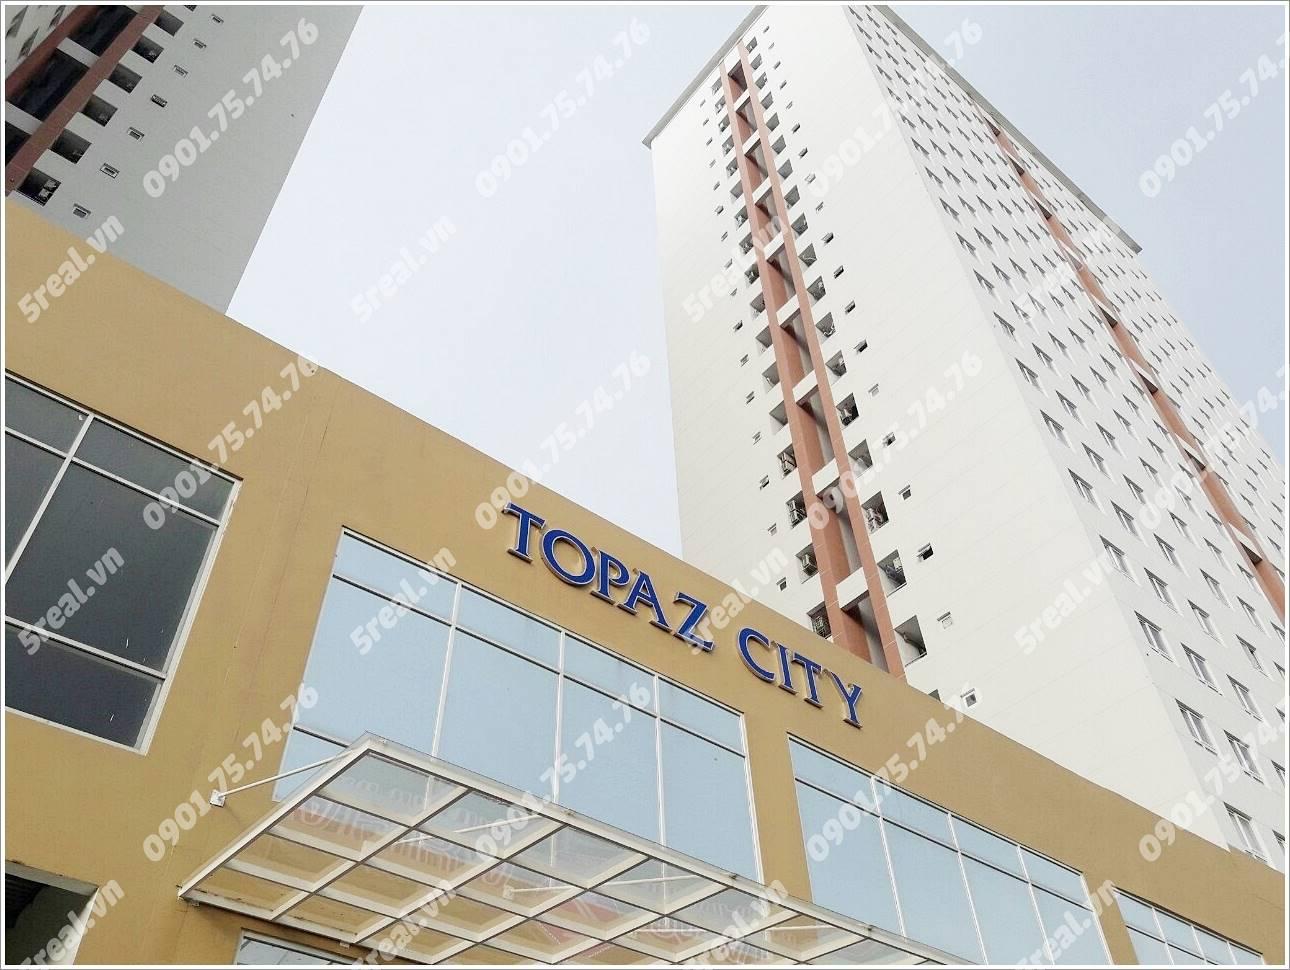 topaz-city-cao-lo-quan-8-van-phong-cho-thue-tphcm-5real.vn-01